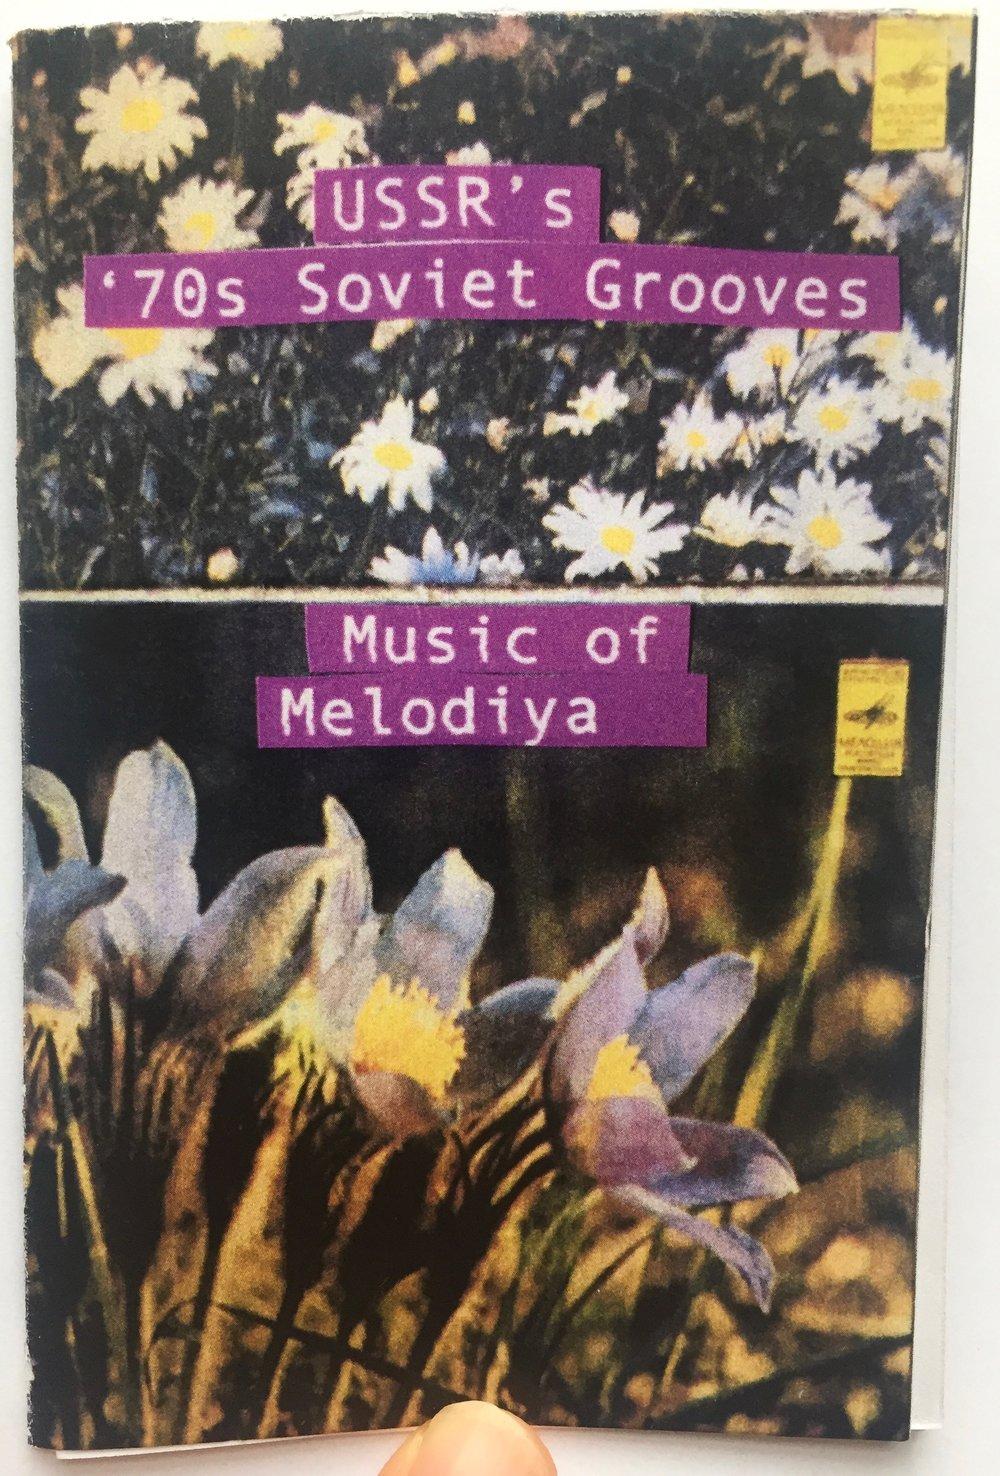 004 - USSR's Melodiya -